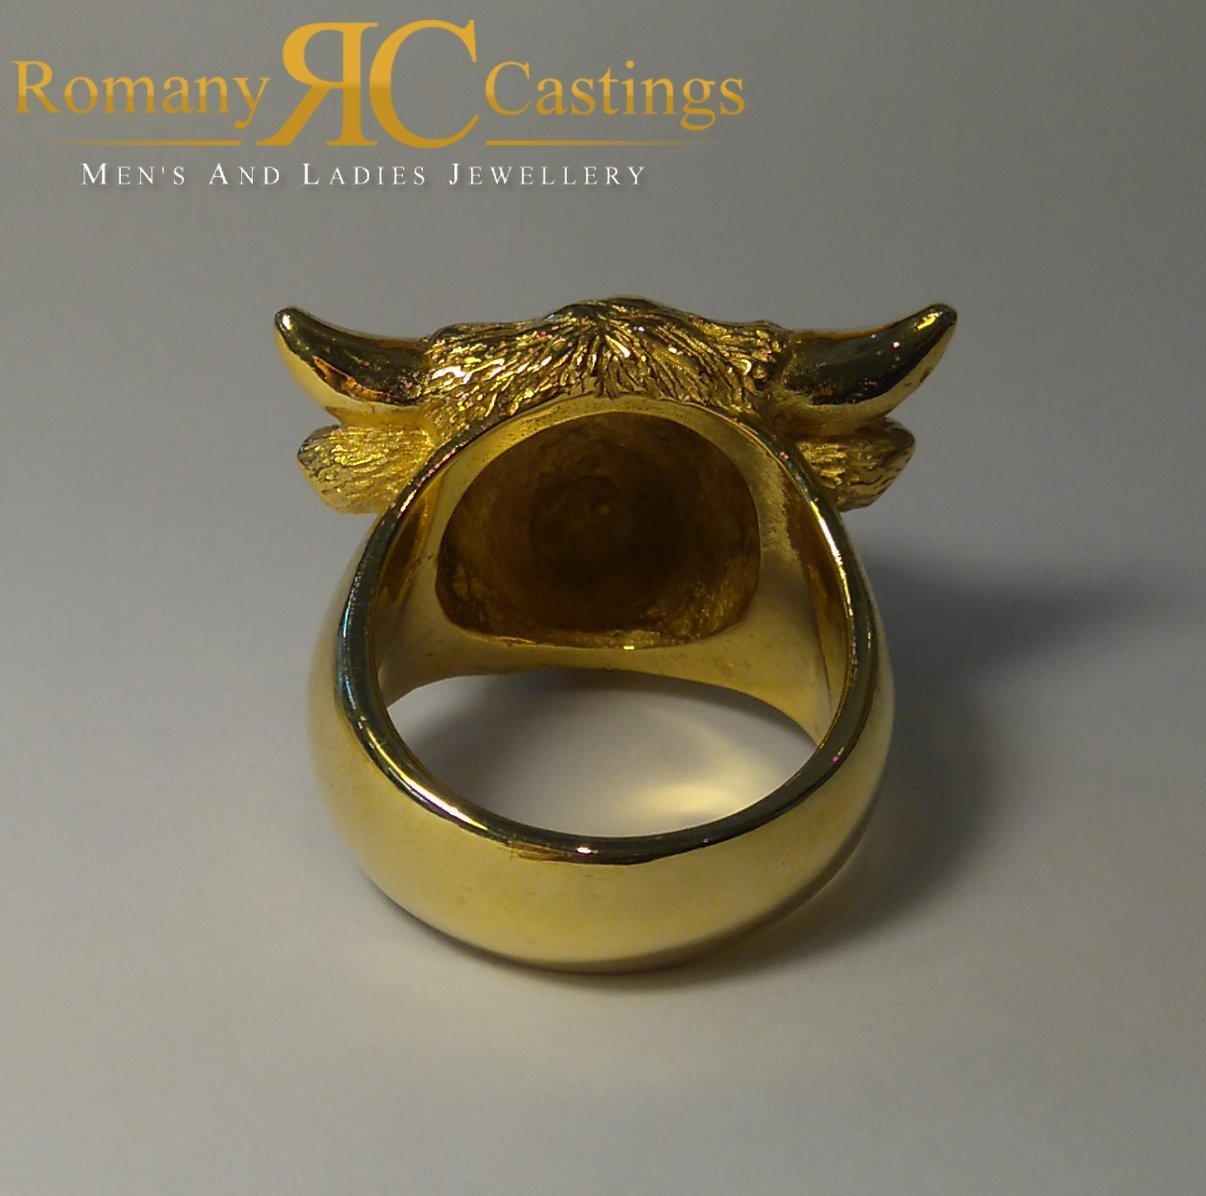 4298d0b07cc06 Heavy Men's Highly Polished Bulls Head Jewellers Bronze Ring 15g 9ct ...